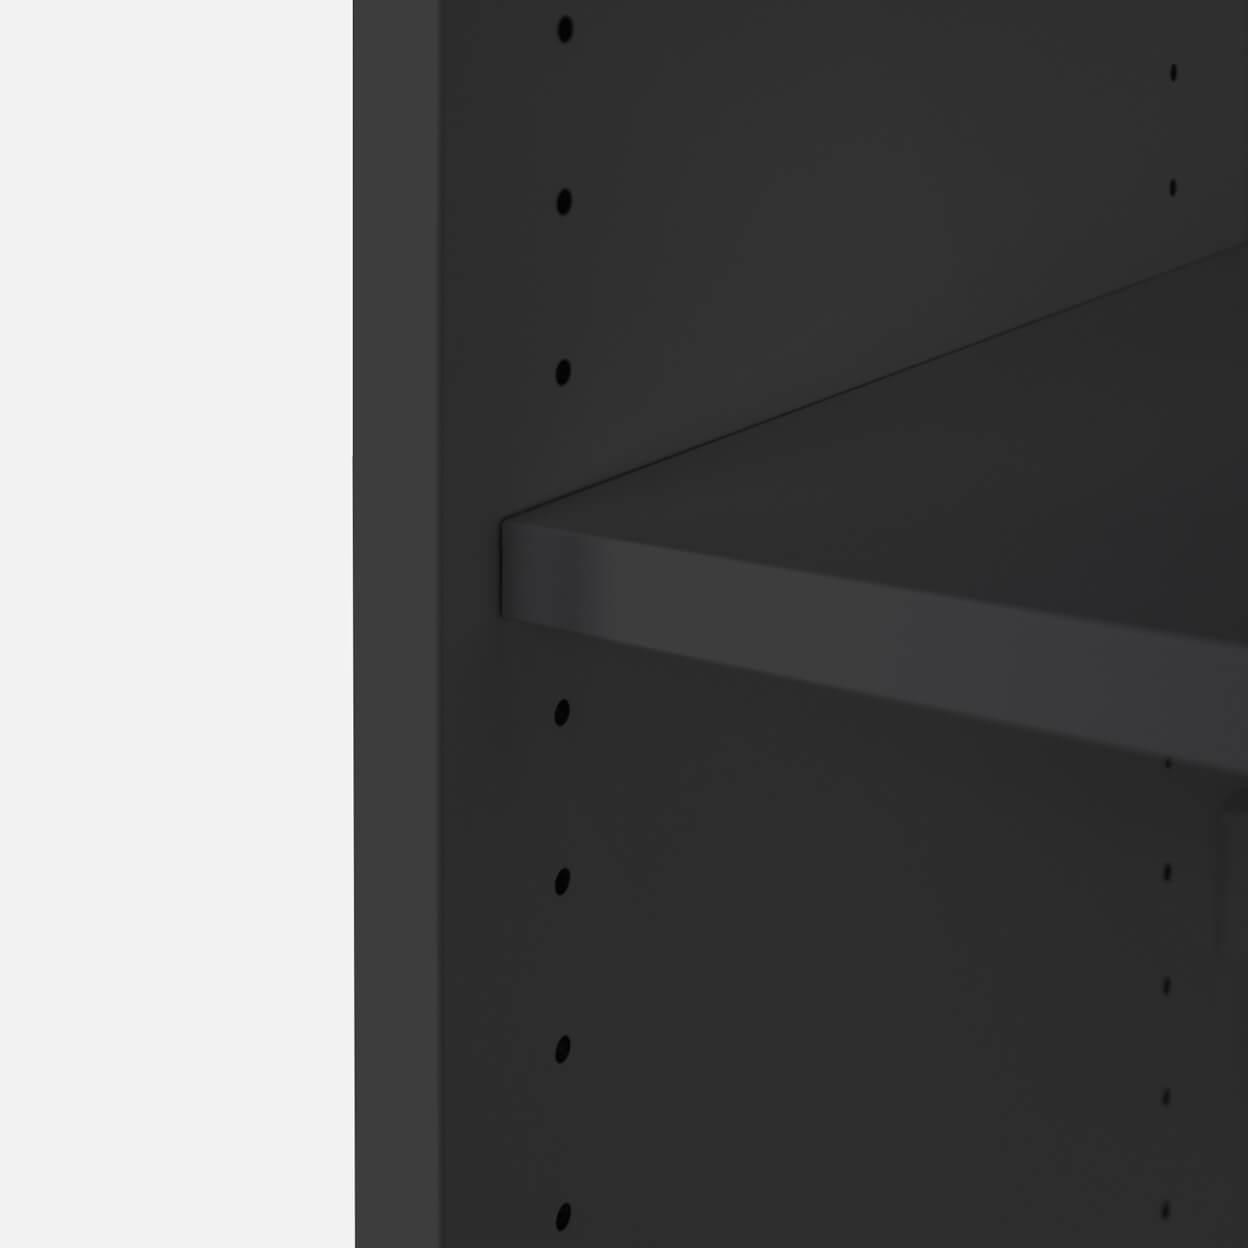 PROFI Aktenschrank abschließbar 2OH Weiß-Anthrazit Schrank Büroschrank Flügeltürenschrank